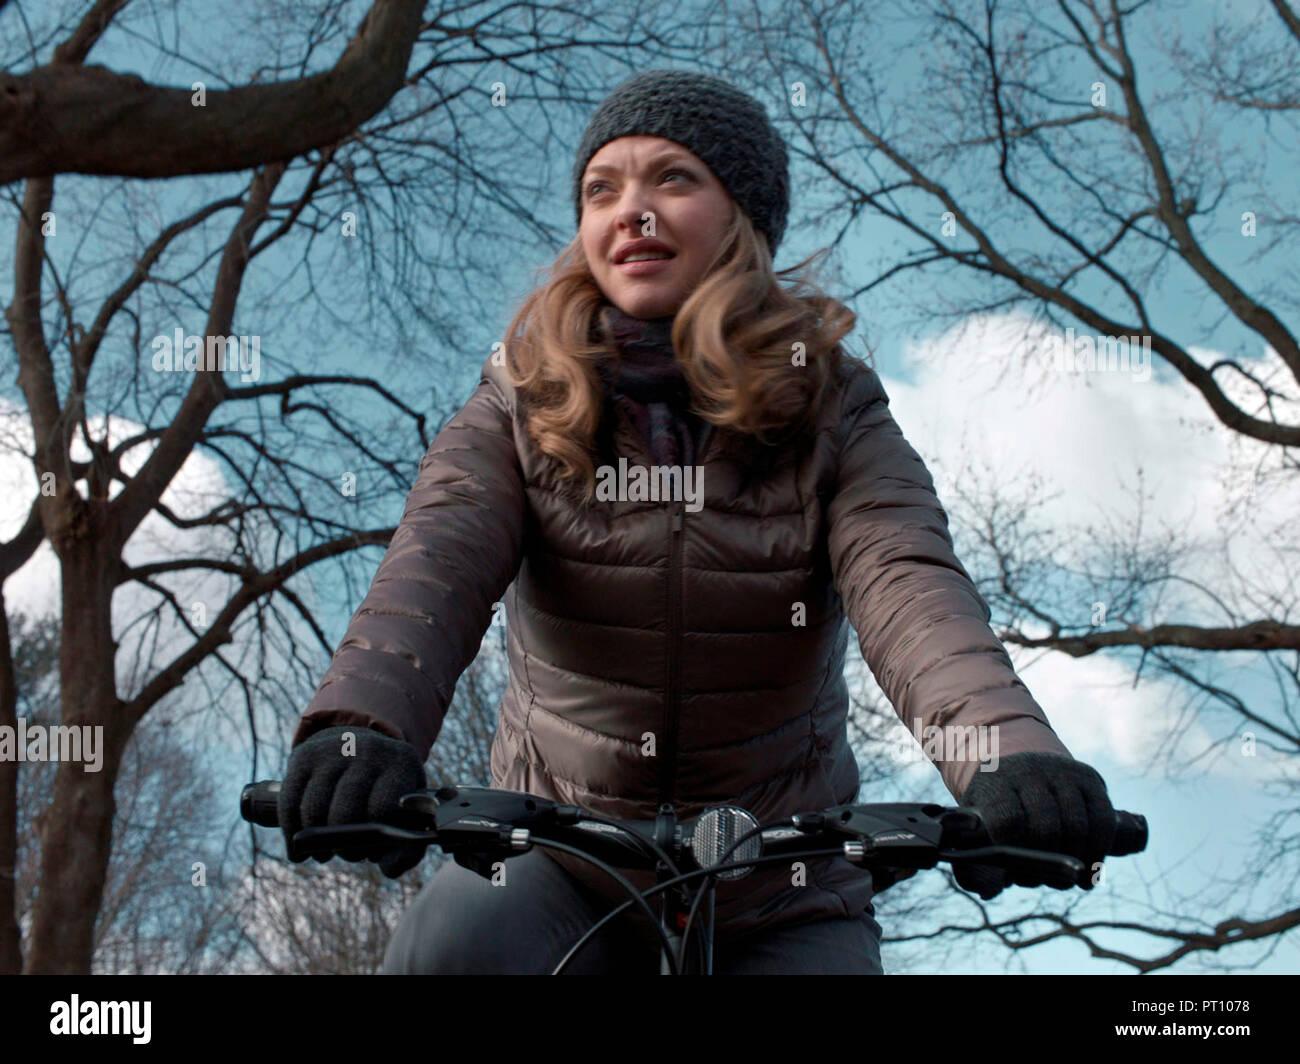 Prod DB © Killer Films - Fibonacci Films - Arclight Films - Omeira Studio Partners / DR FIRST REFORMED de Paul Schrader 2017 USA Amanda Seyfried. autr - Stock Image